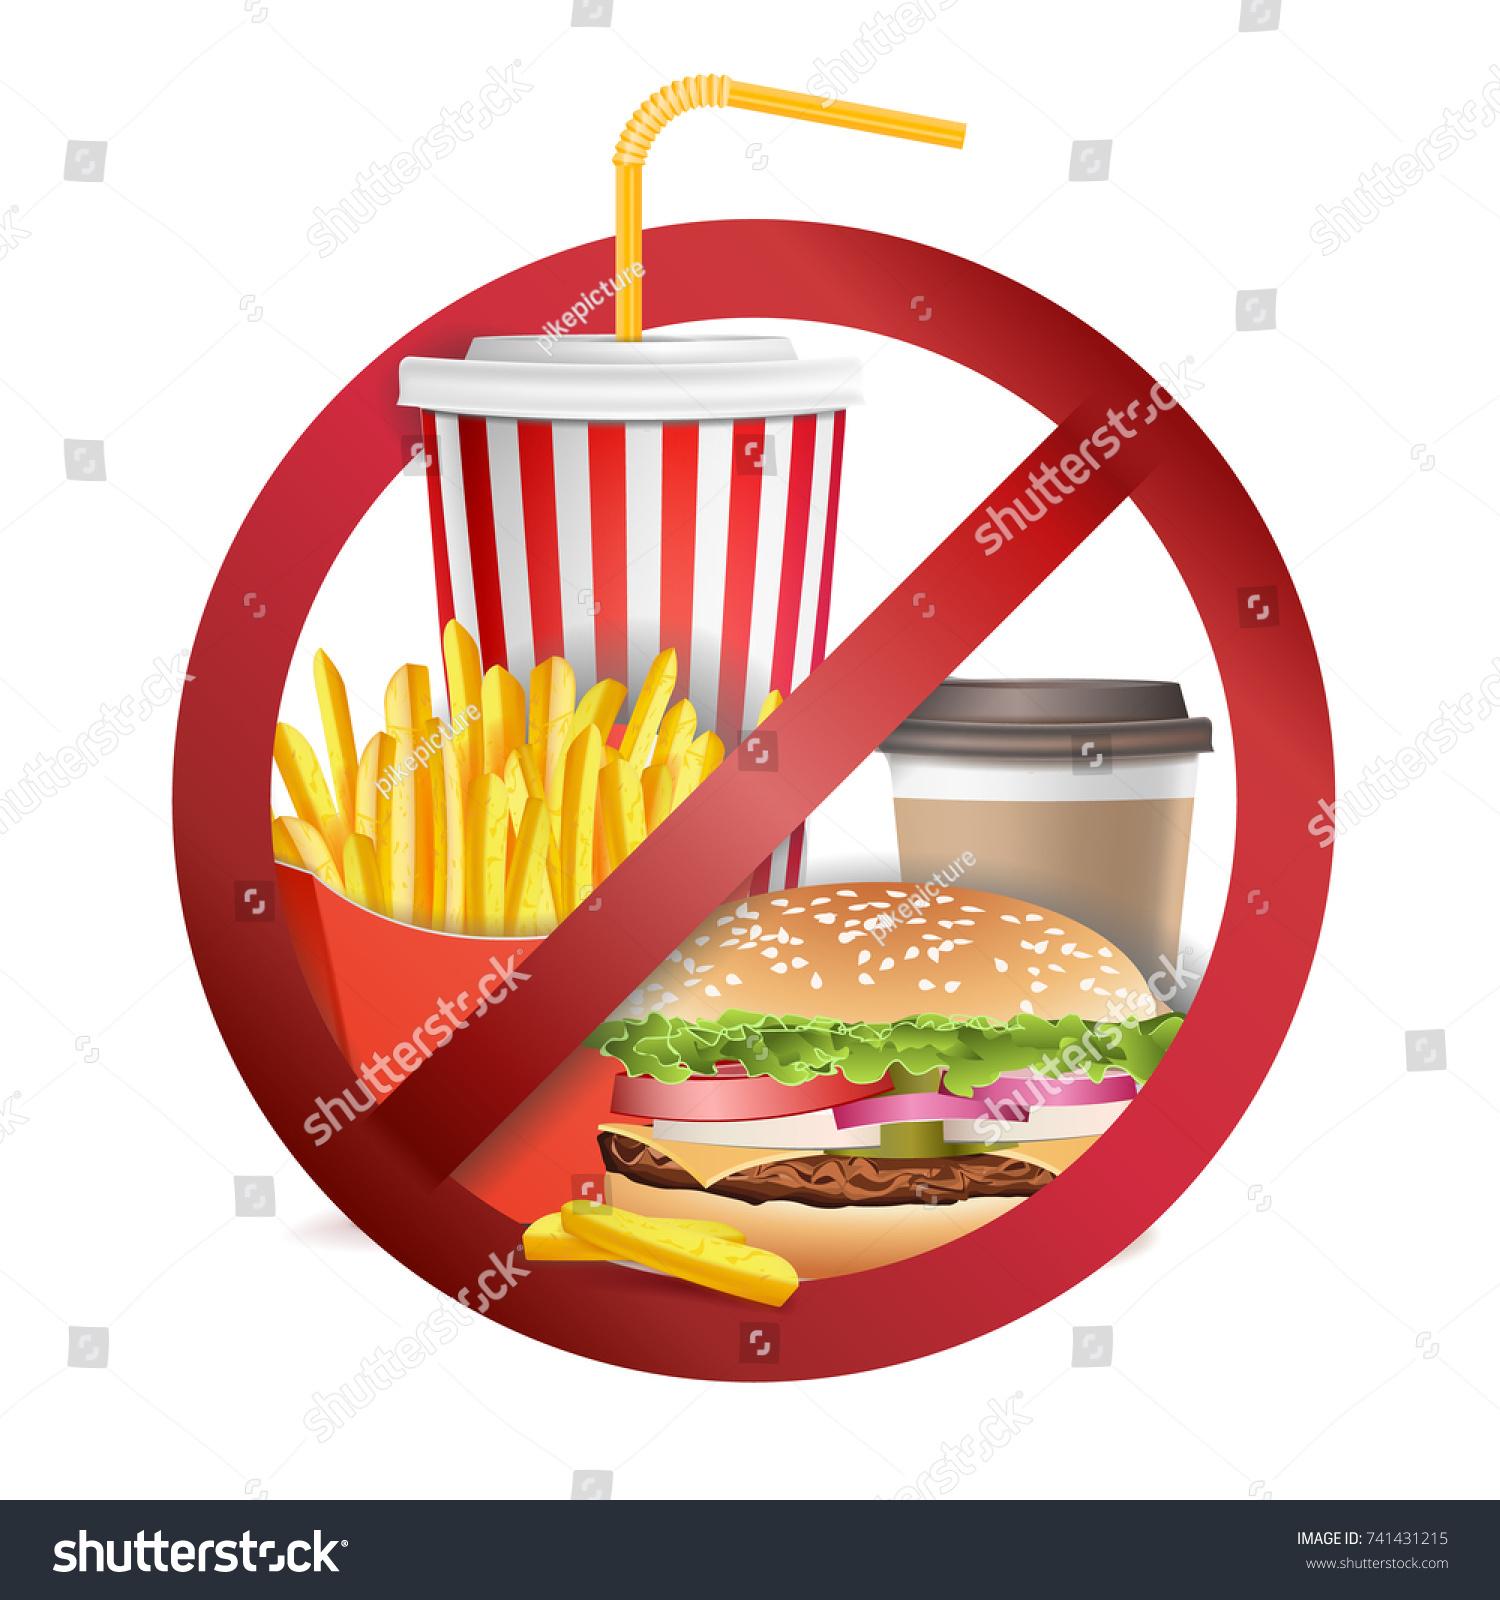 Fast Food Danger Vector No Food Stock Vector Royalty Free